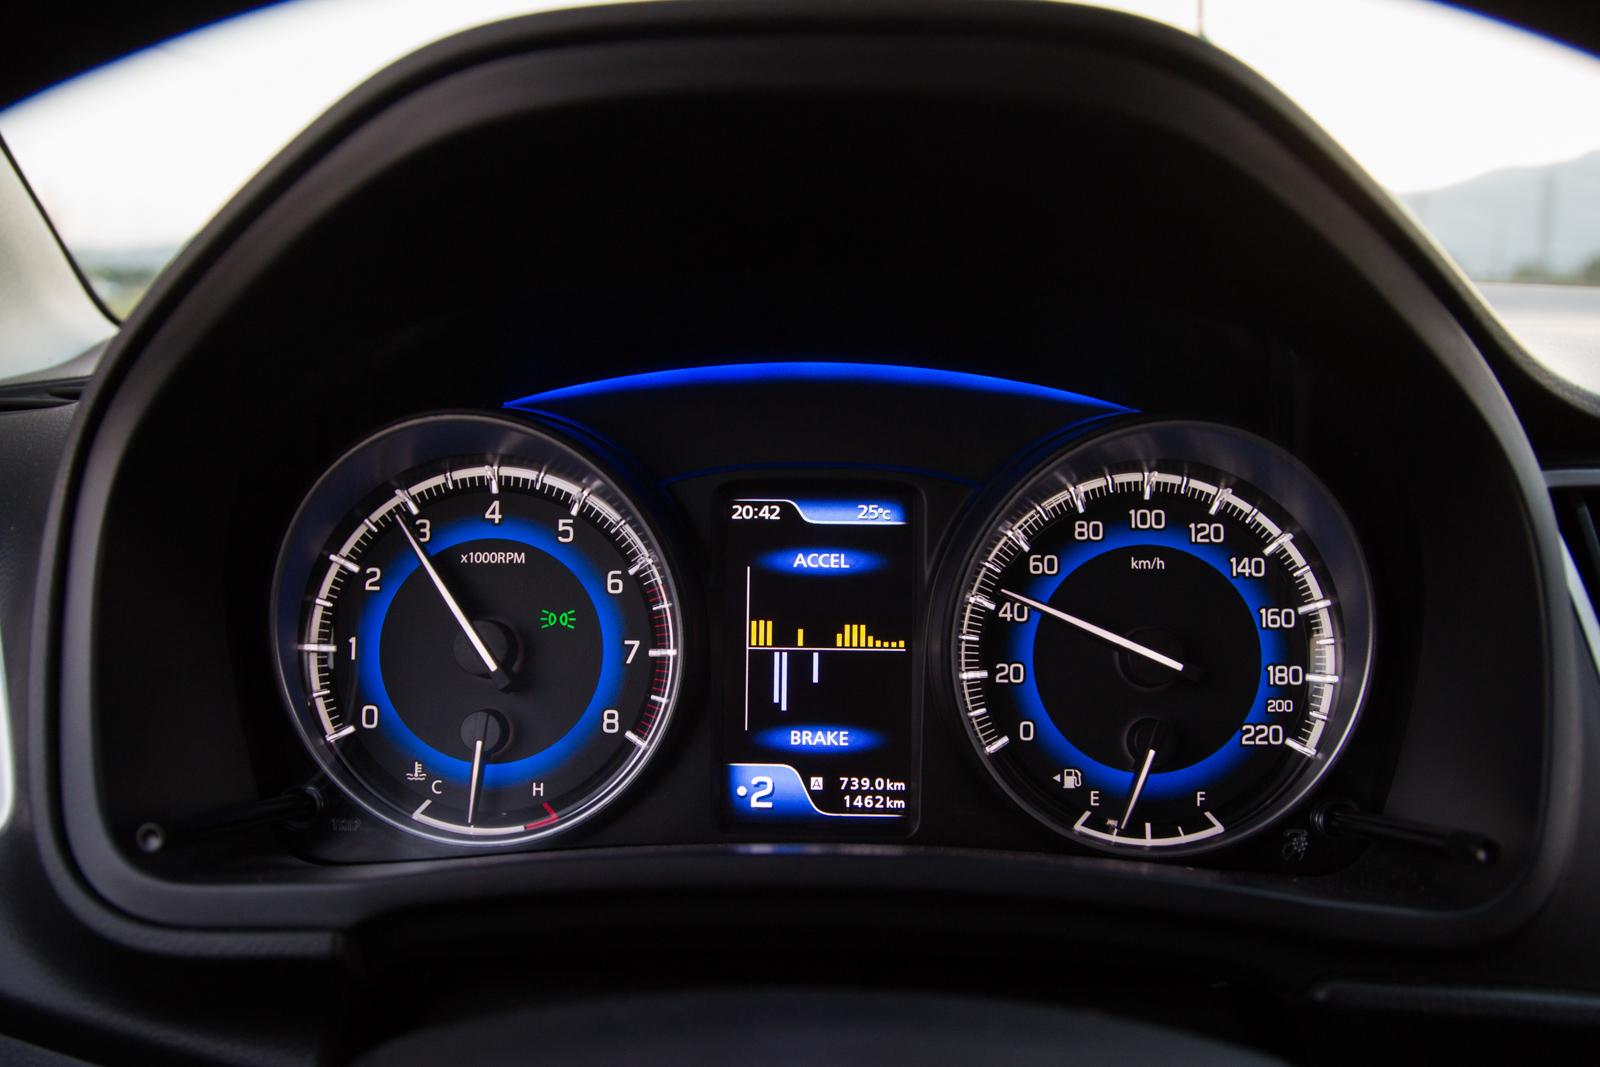 Test_Drive_Suzuki_Baleno_BoosterJet_62